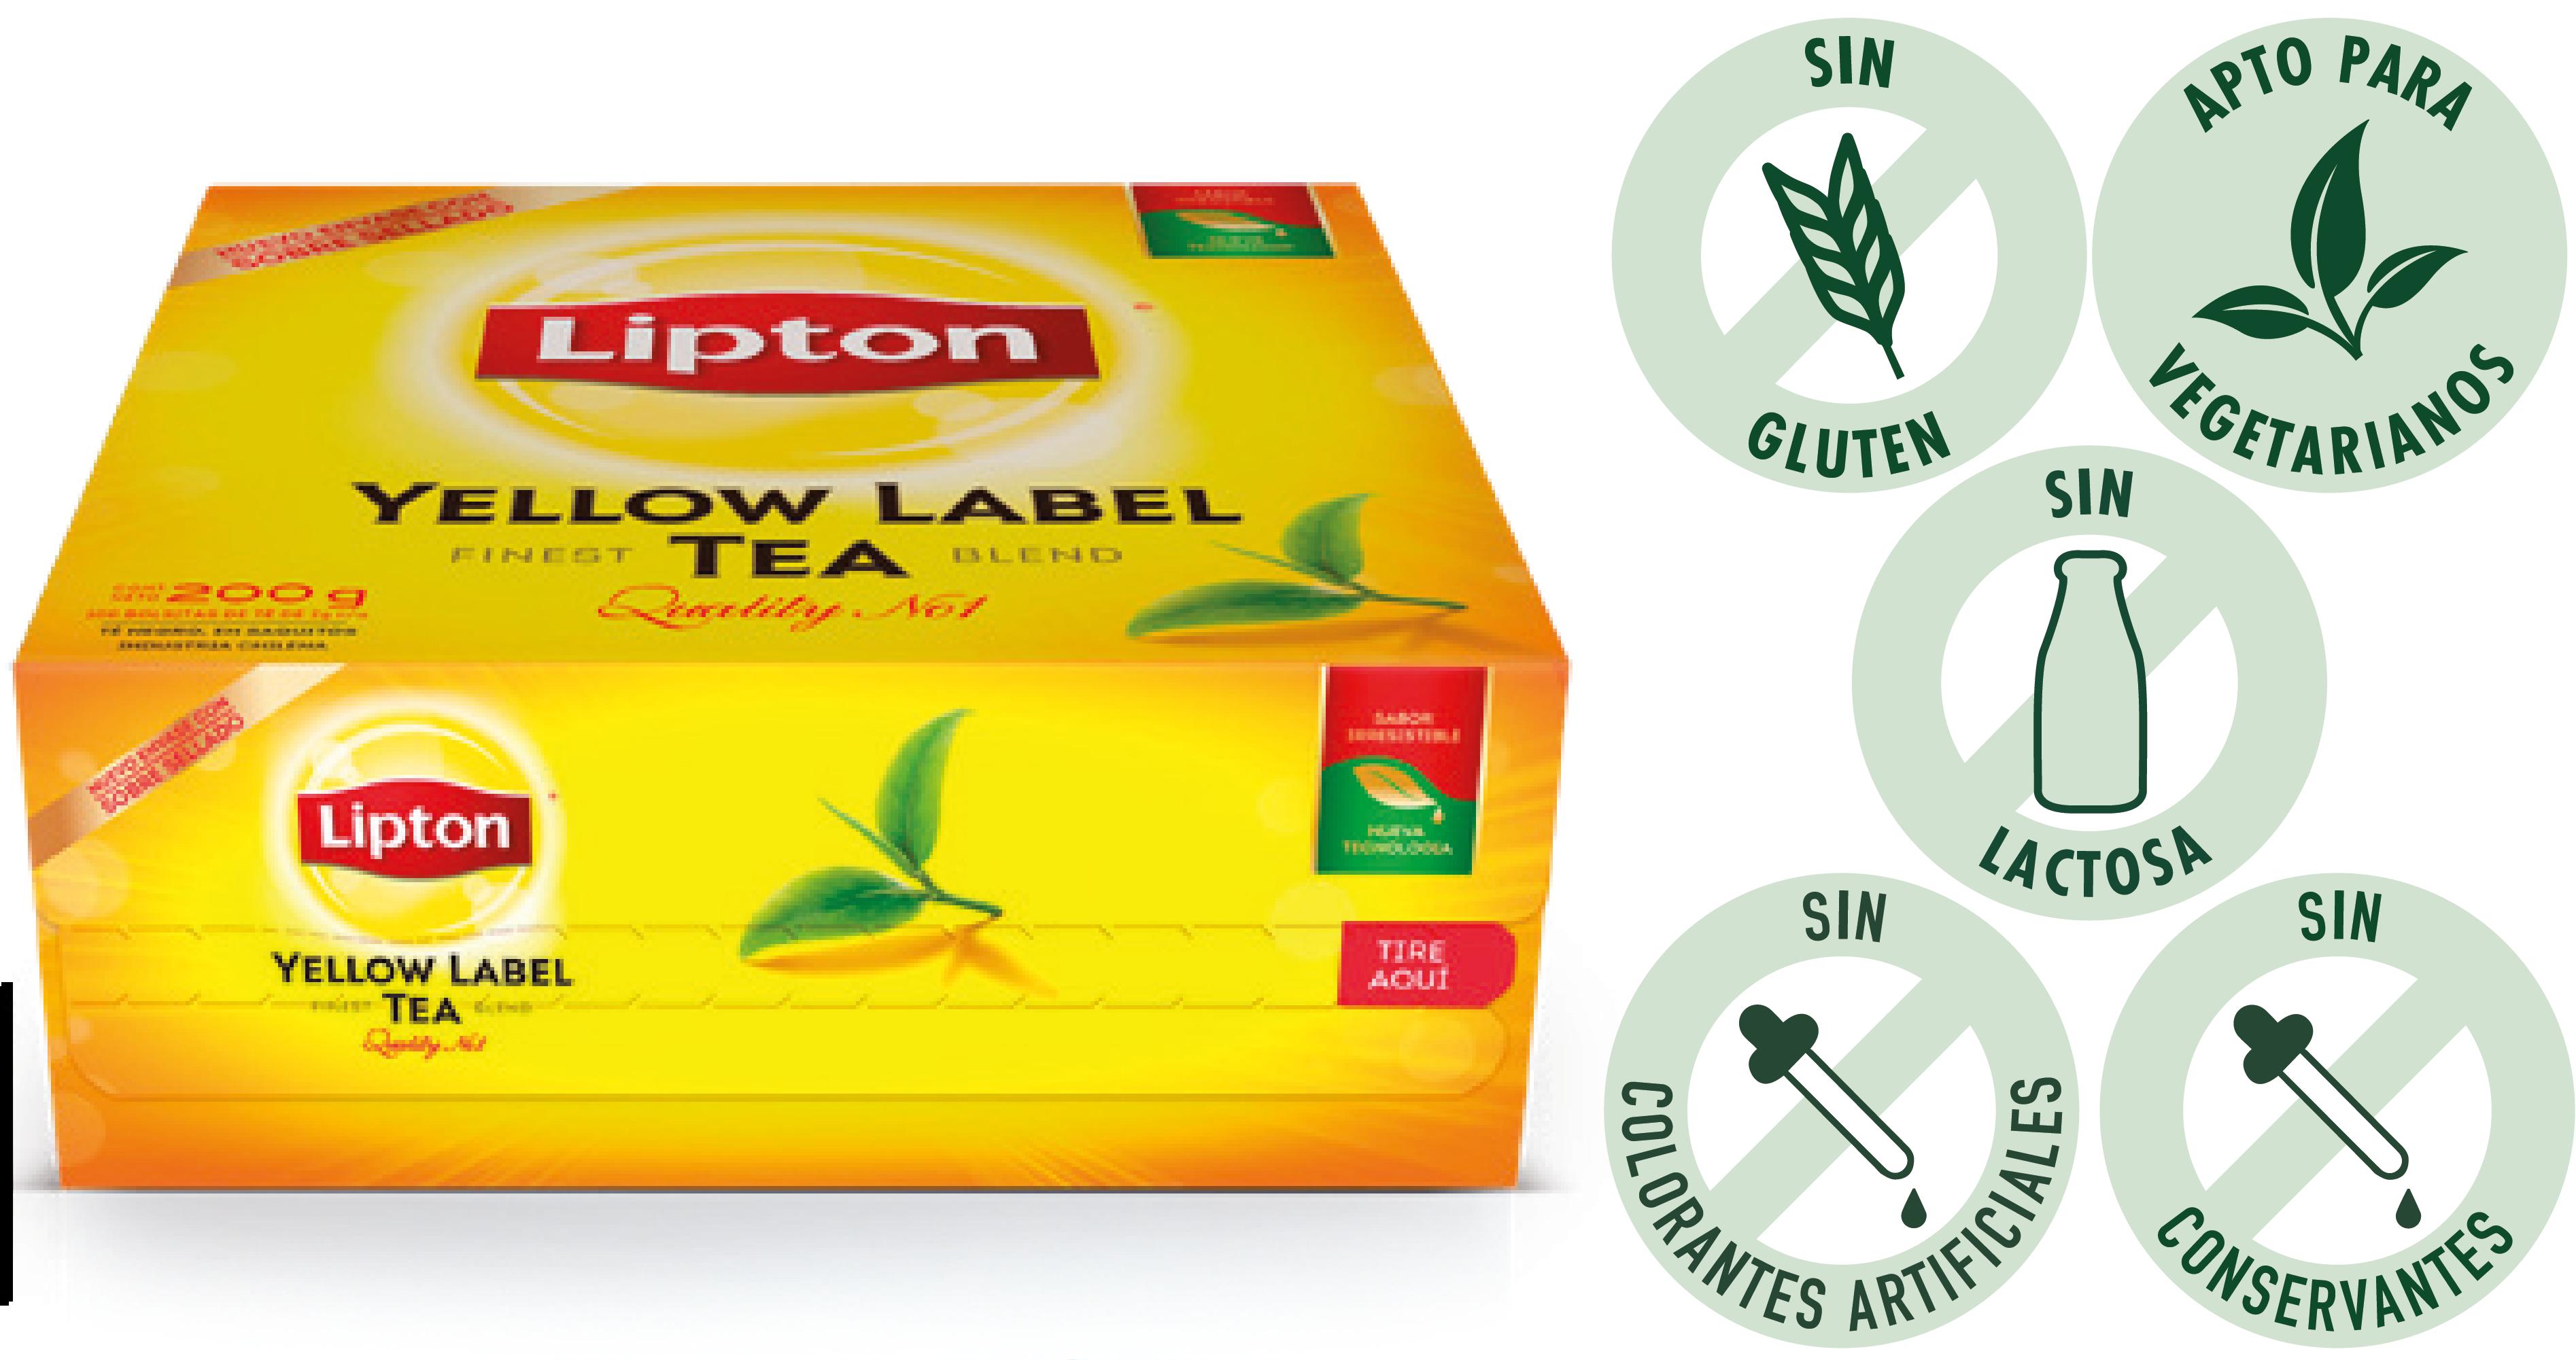 Té Yellow Label Lipton 100 BLS (Exclusivo de Argentina)